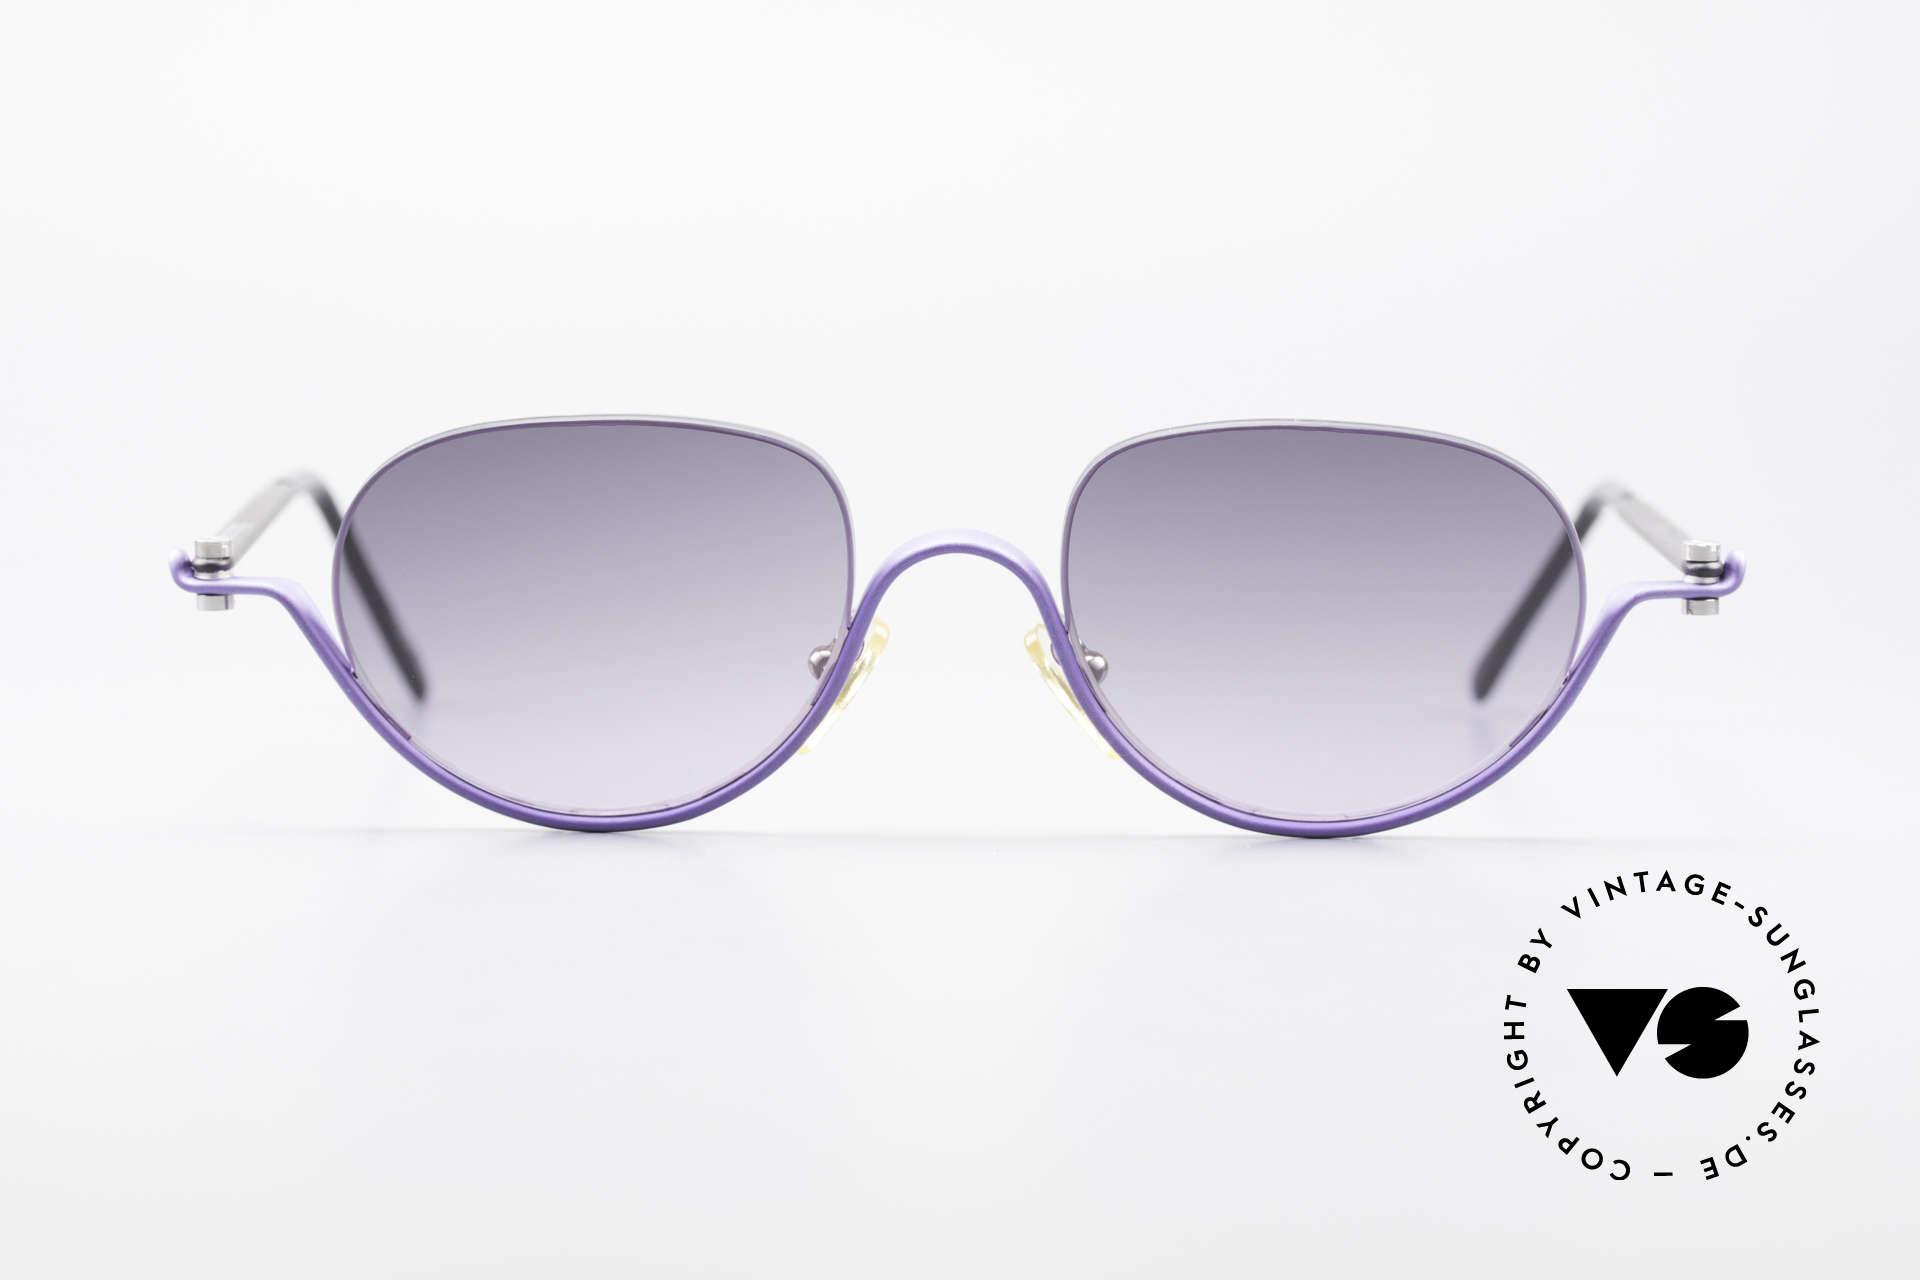 ProDesign No8 Gail Spence Design Sunglasses, true vintage aluminium frame - Gail Spence Design, Made for Women